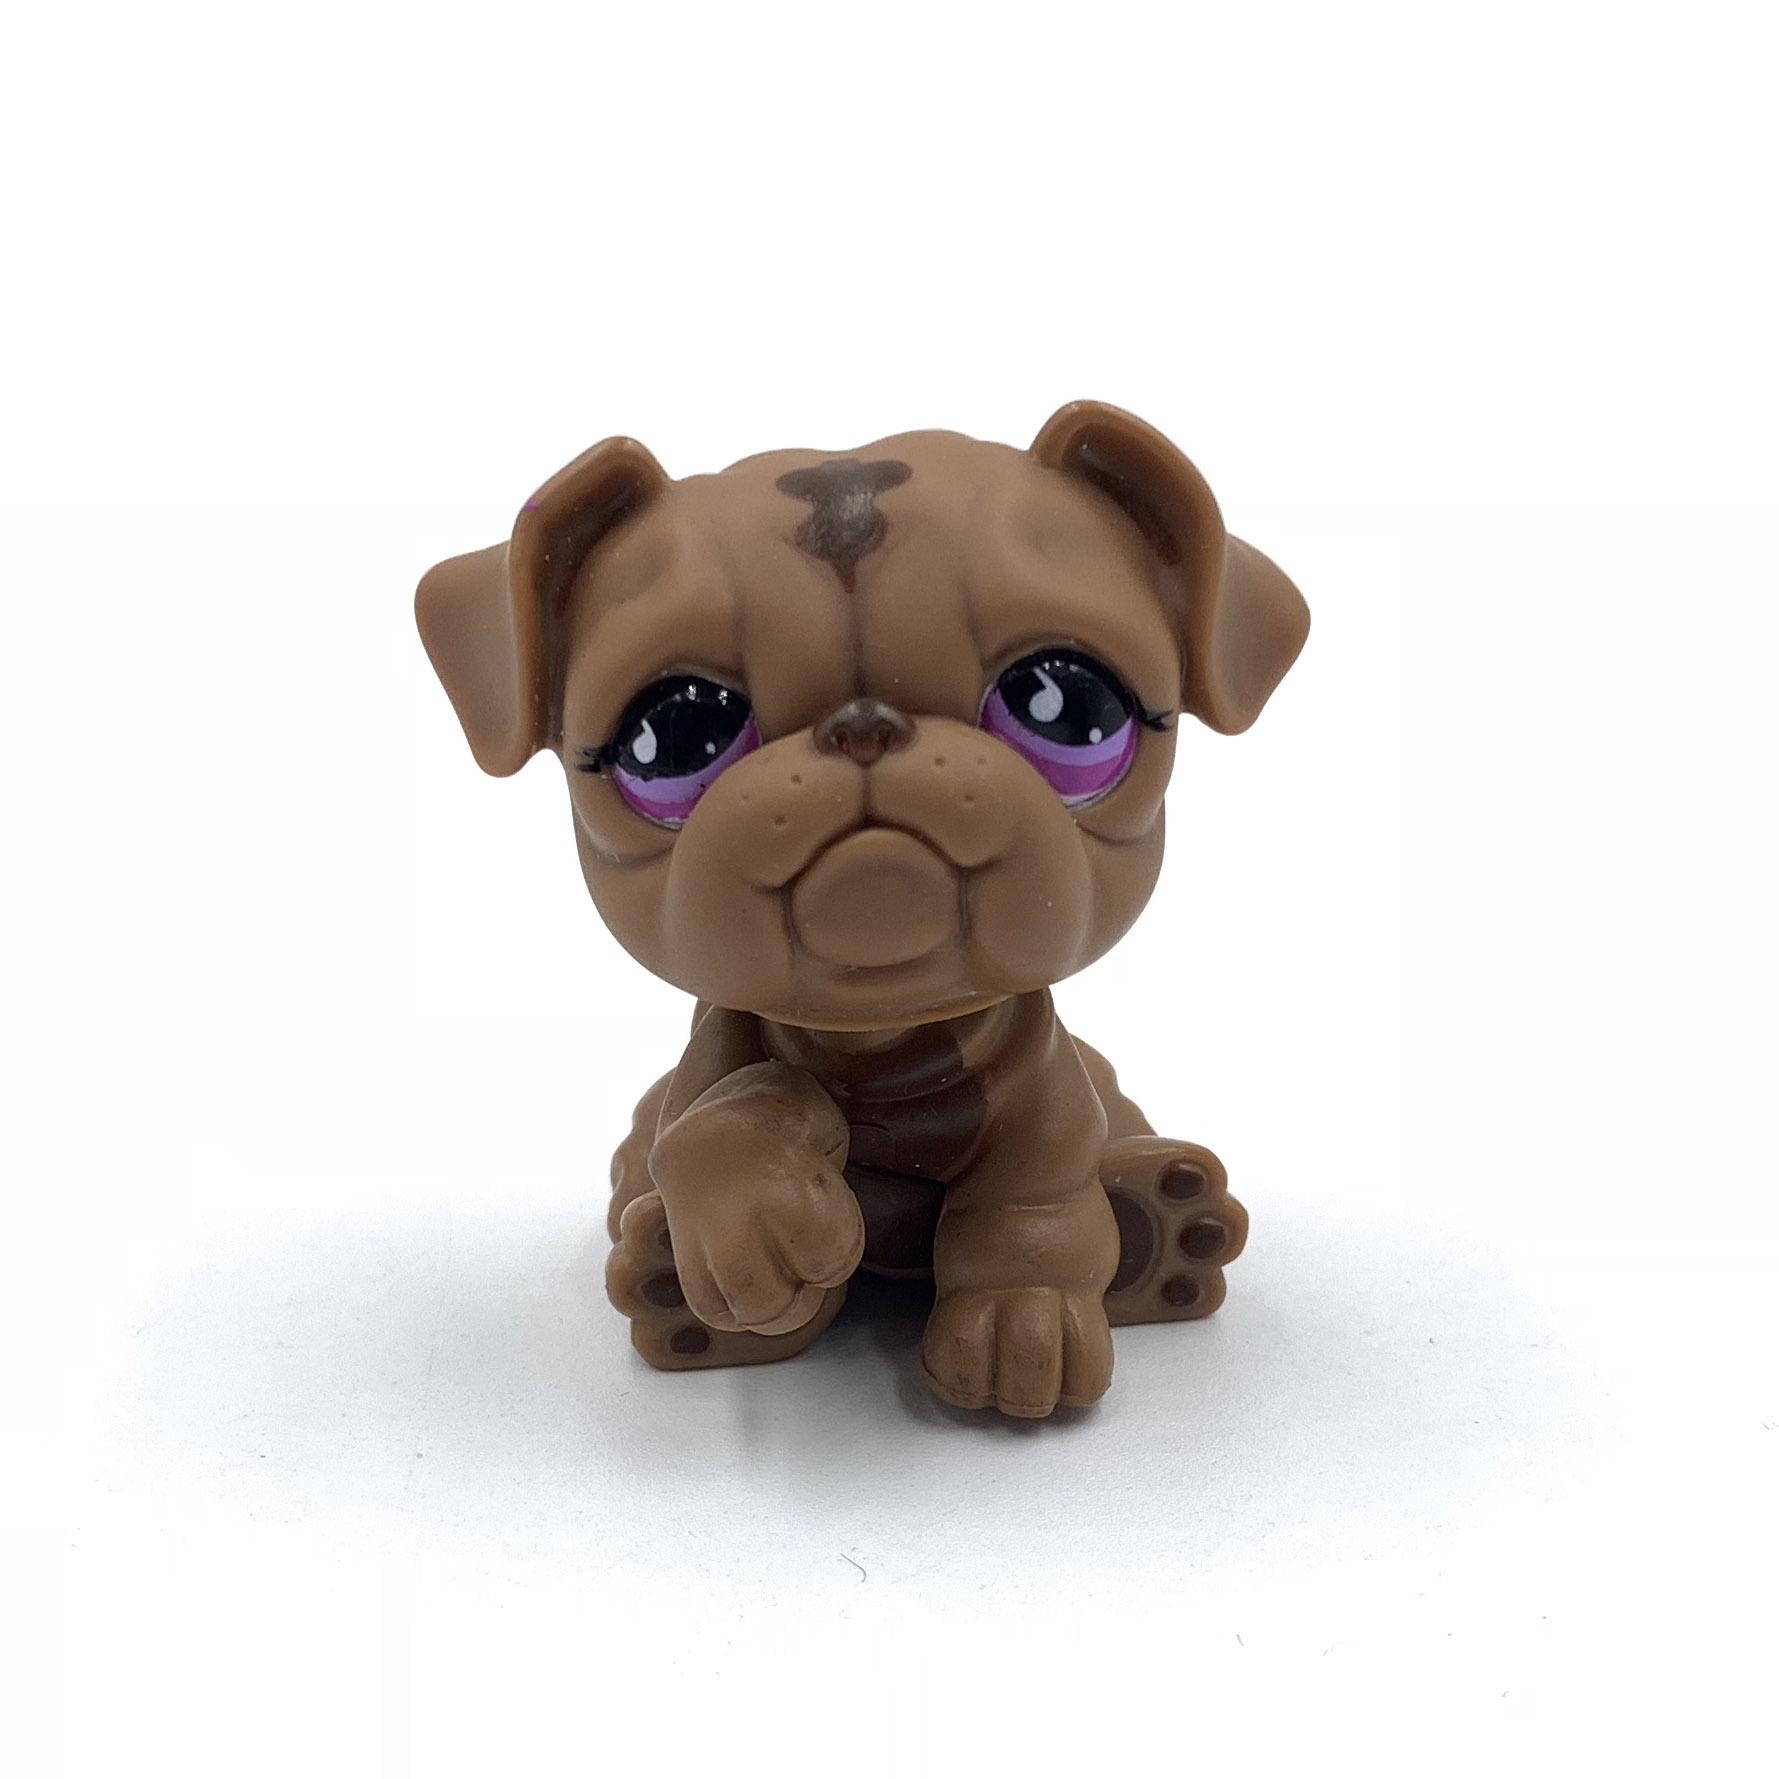 Old Pet Shop Toys BULLDOG Dog 881 Bronw Dog With Pink Eyes Old Original Model Toy For Kids Christmas Gift